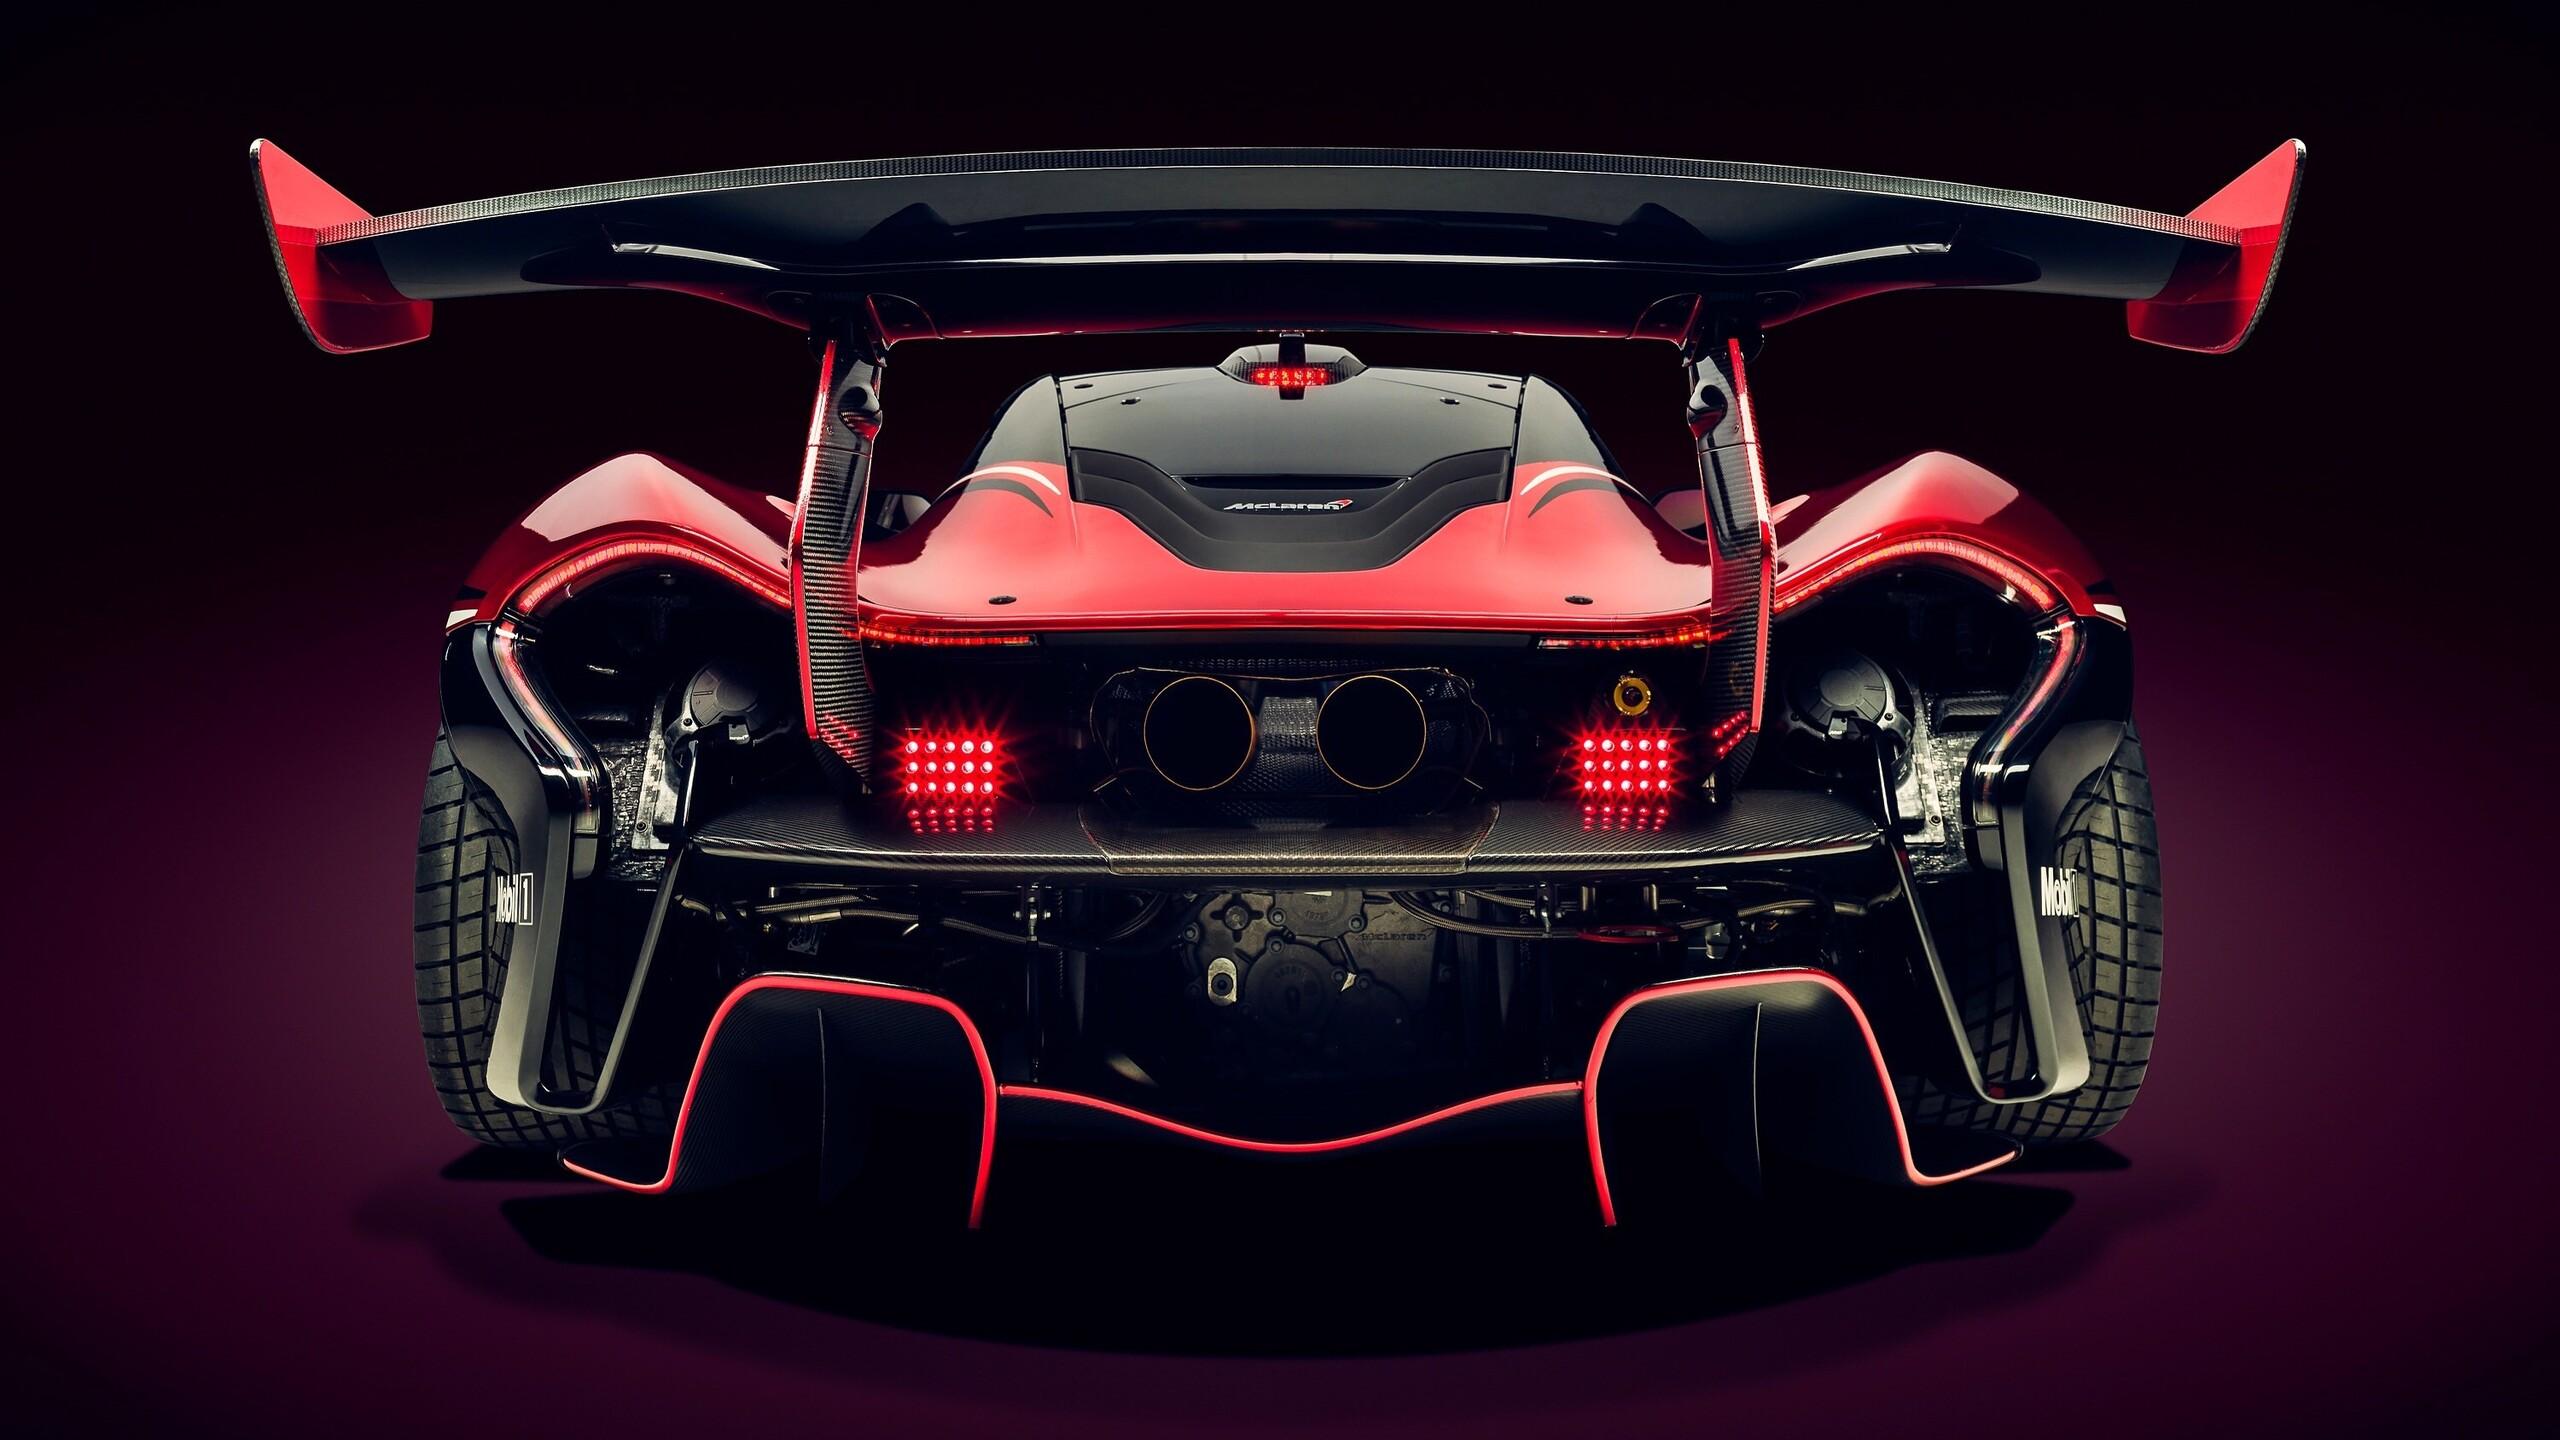 2560x1440 Mclaren P1 Super Car 1440p Resolution Hd 4k Wallpapers